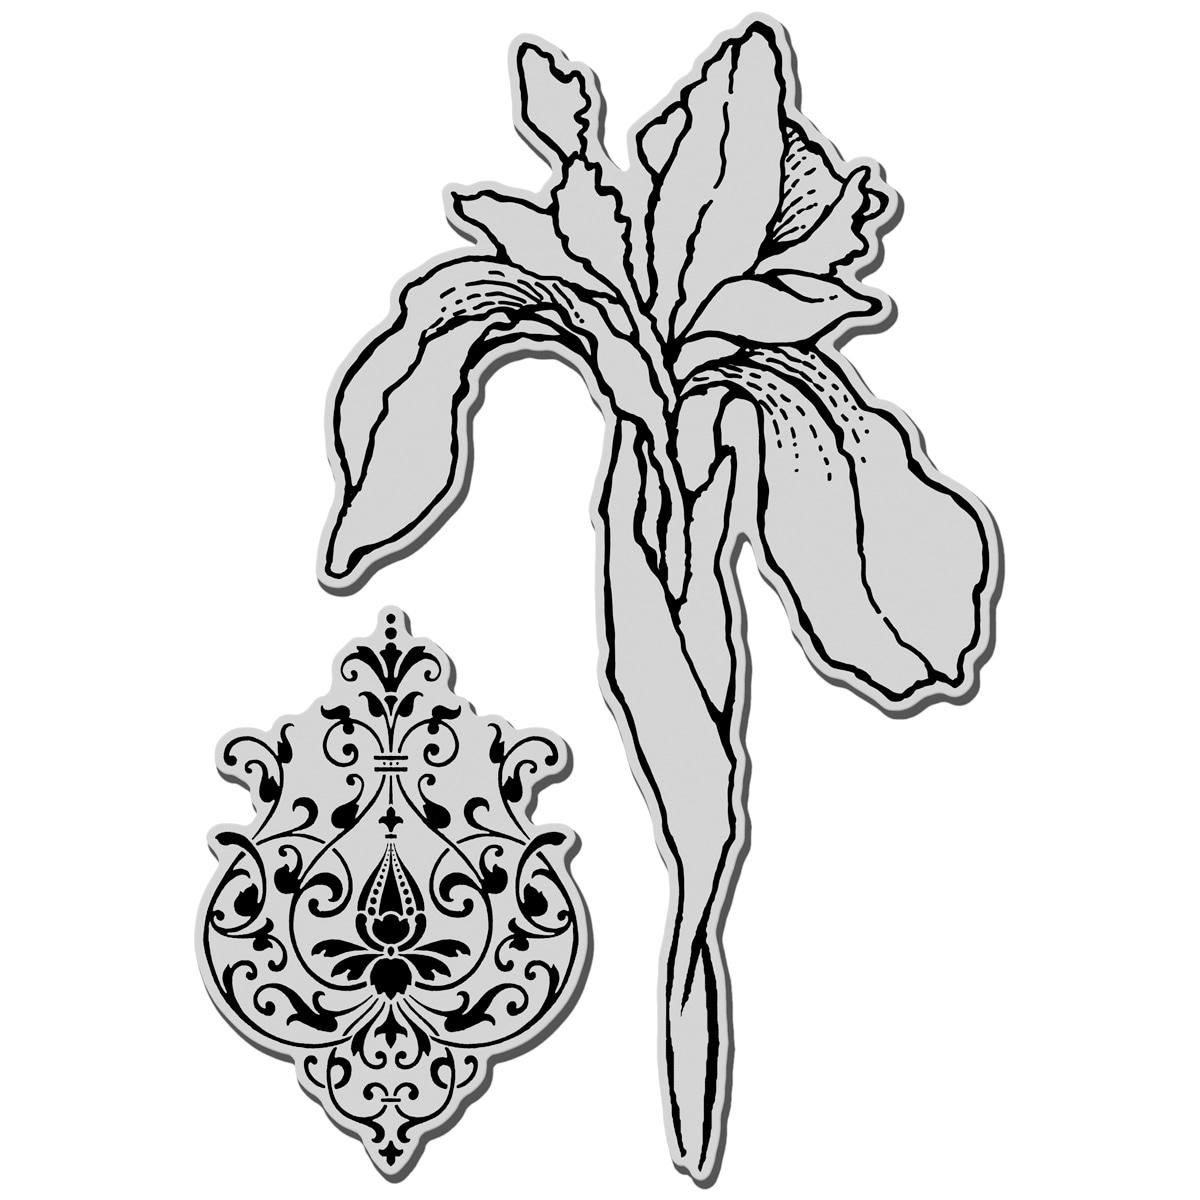 Stampendous Jumbo Cling Rubber Stamp-Iris